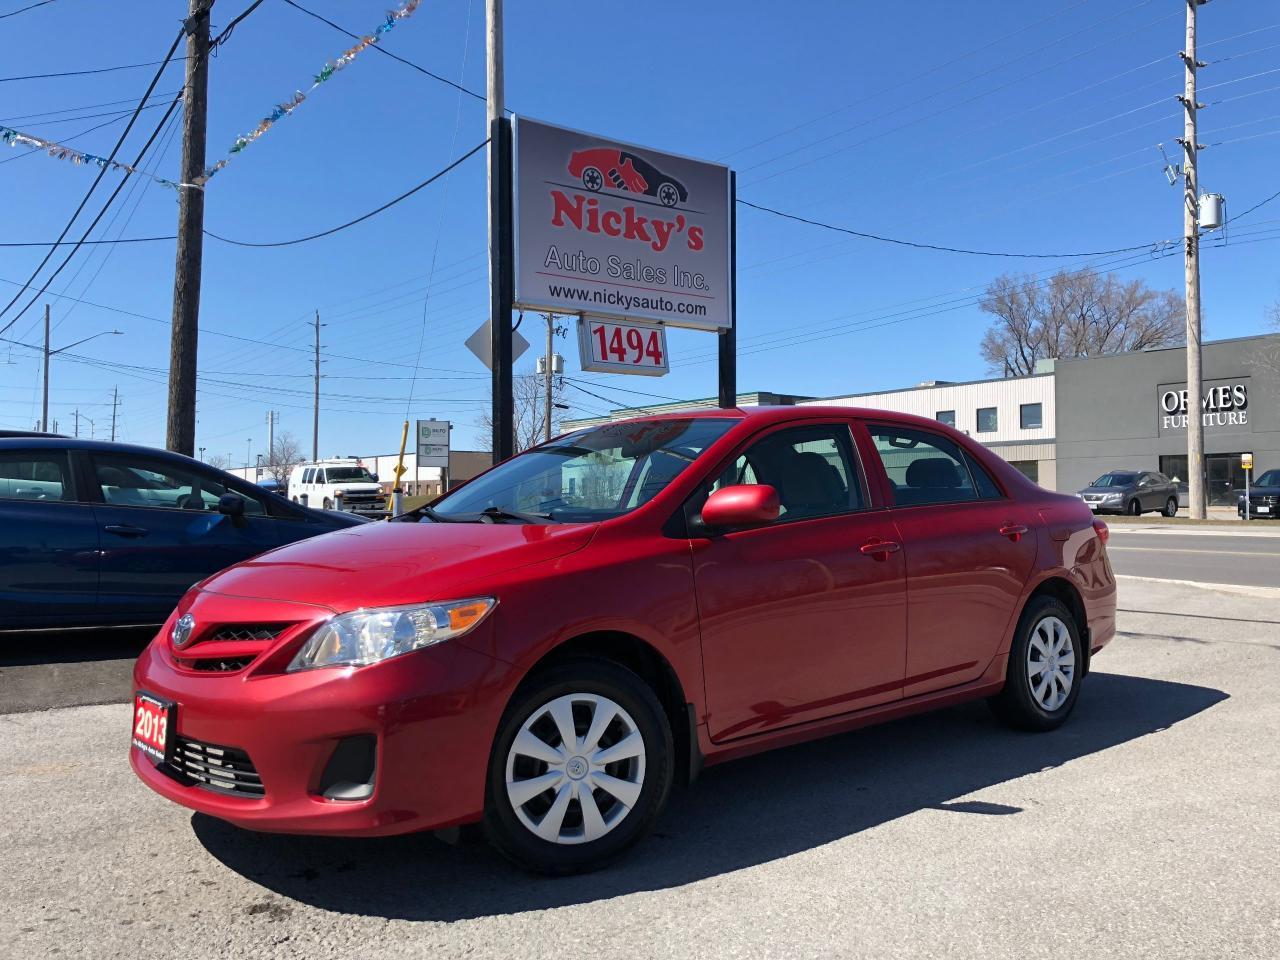 2013 Toyota Corolla CE - AUTO - CRUISE - LOADED!  $57 WEEKLY!